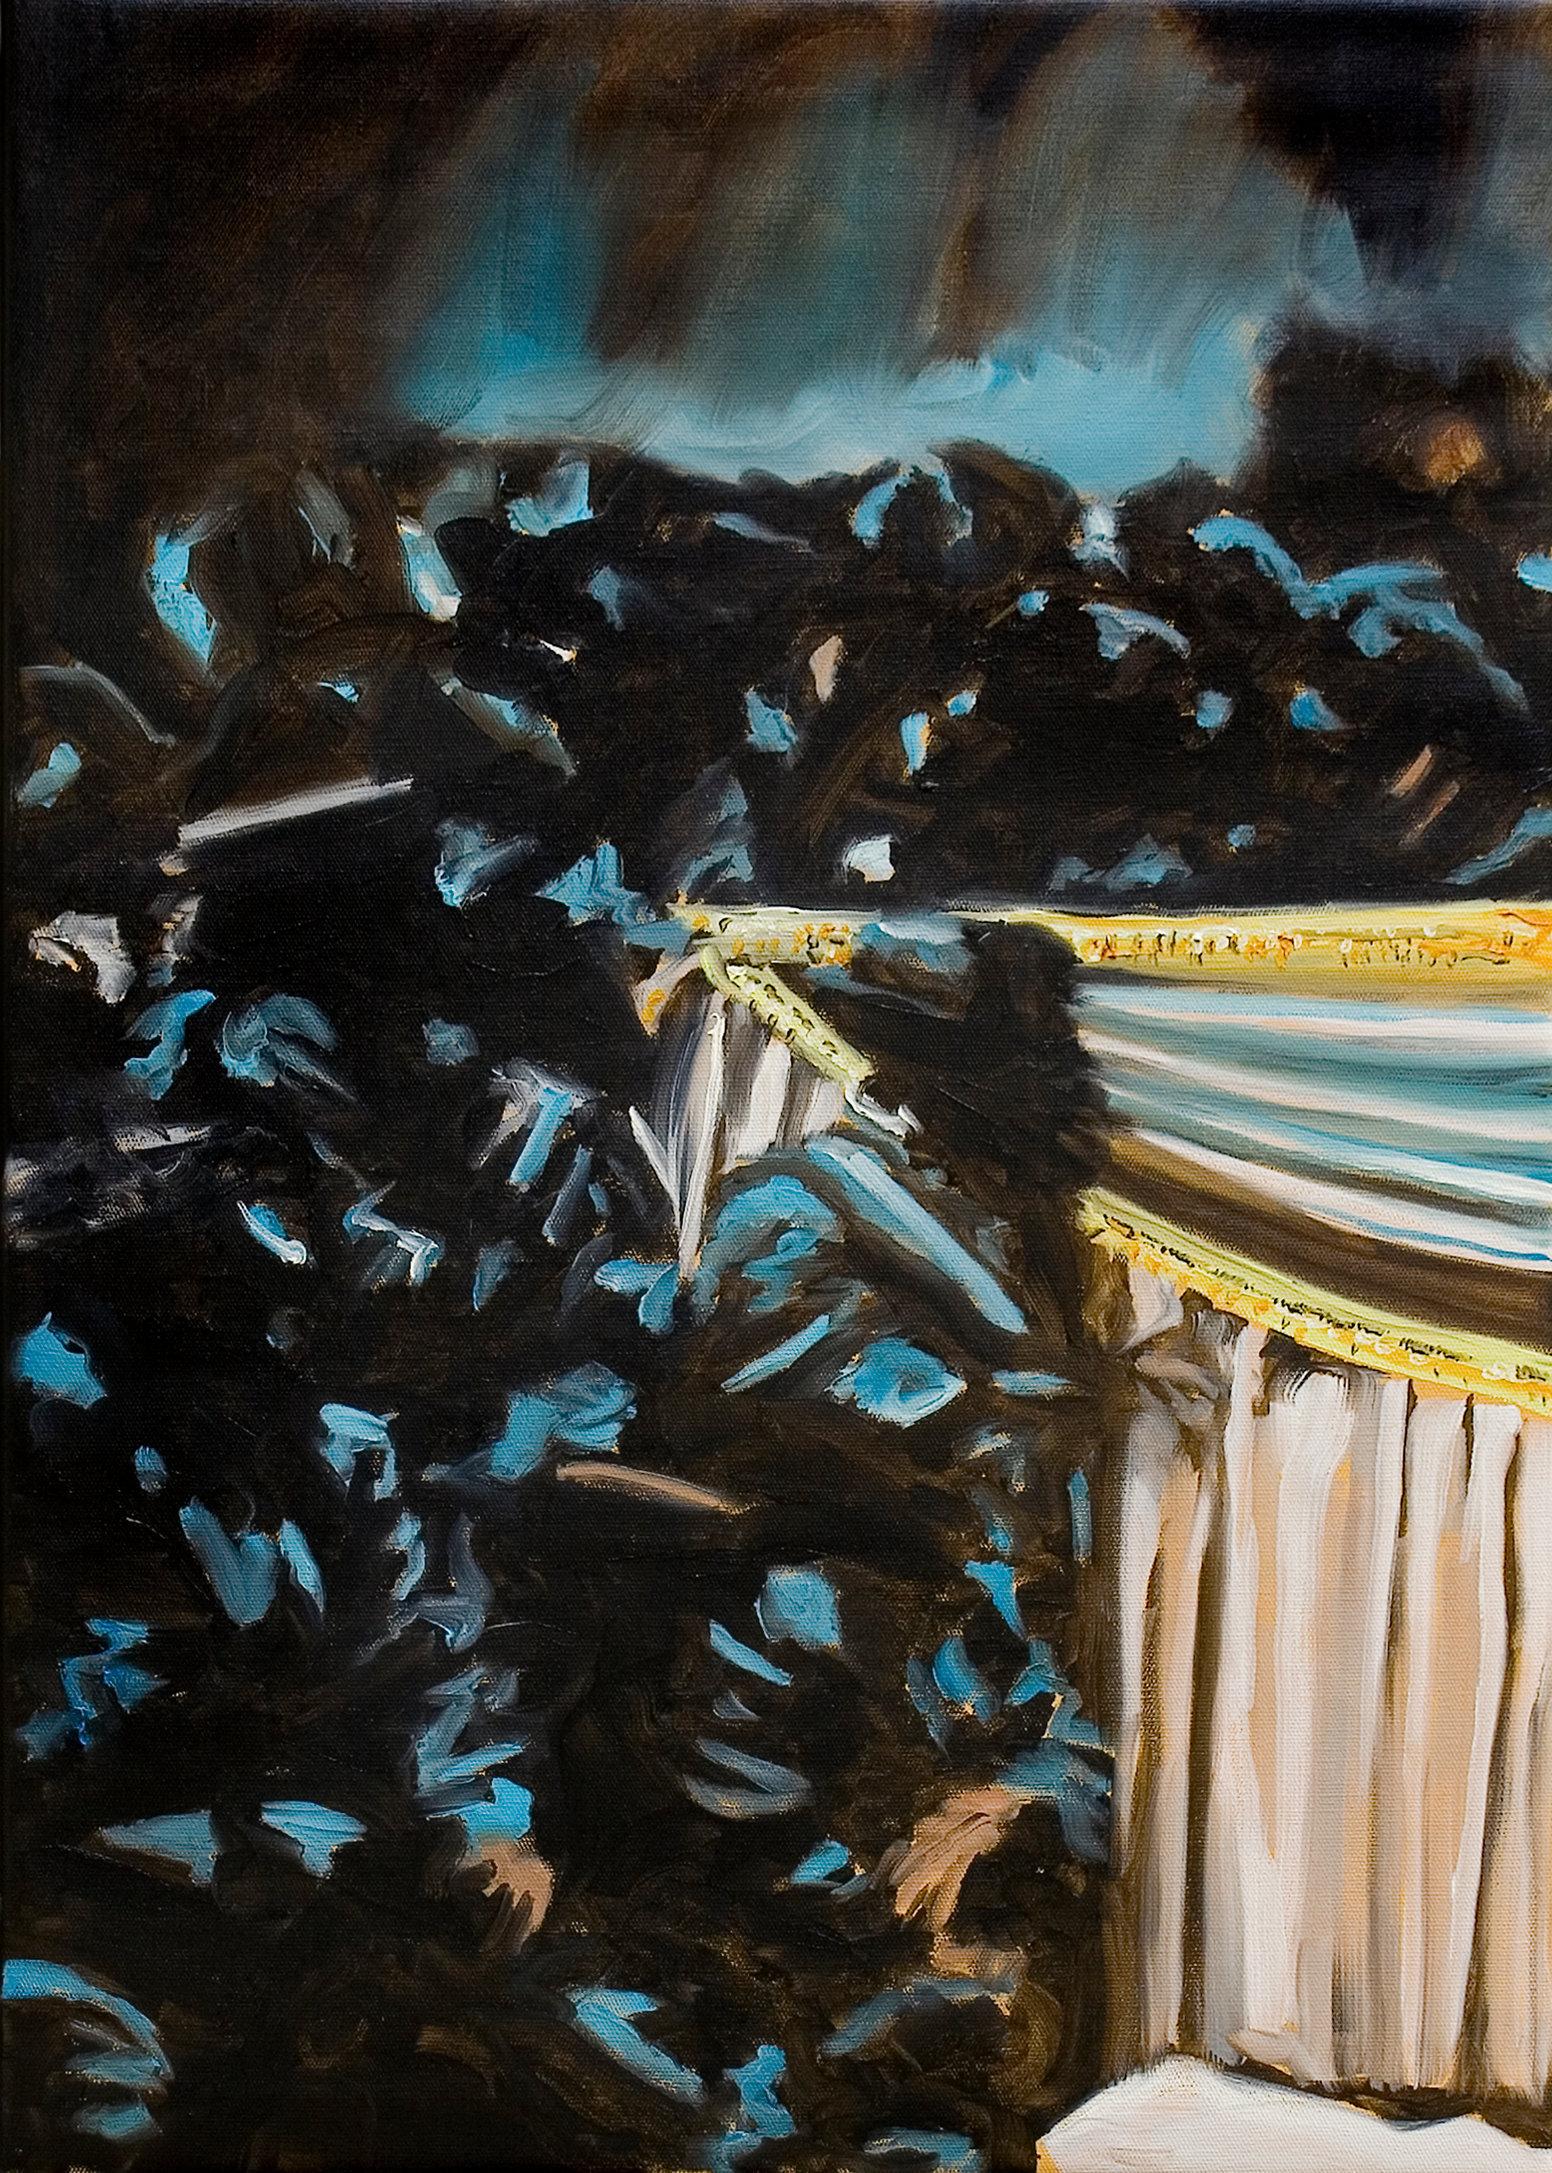 Whats behind the curtain.2016.70x50cm.Öl.jpg